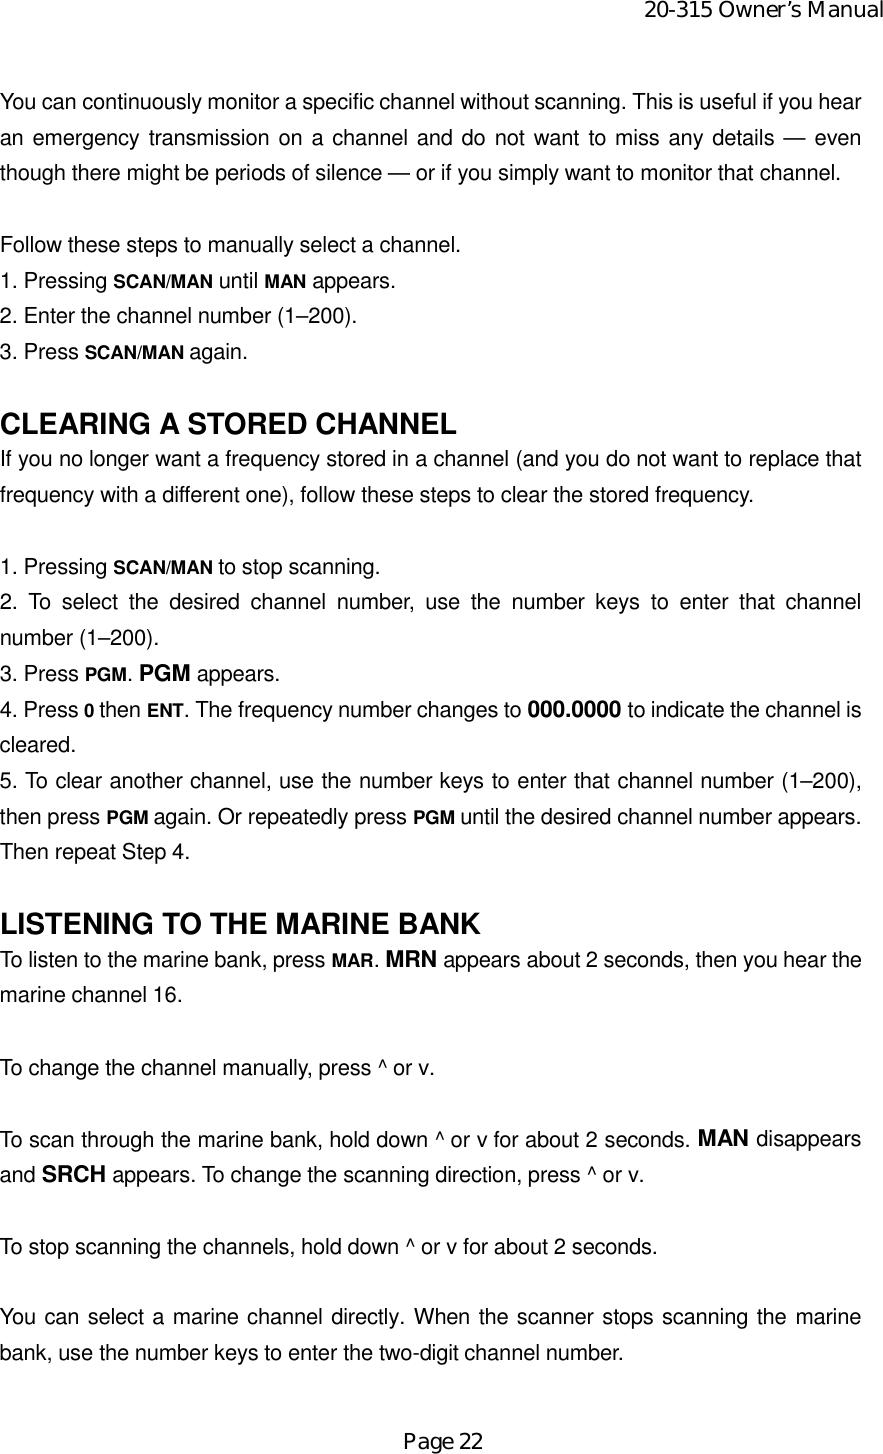 Radio Shack 2000315 Scanning Receiver User Manual Owner s